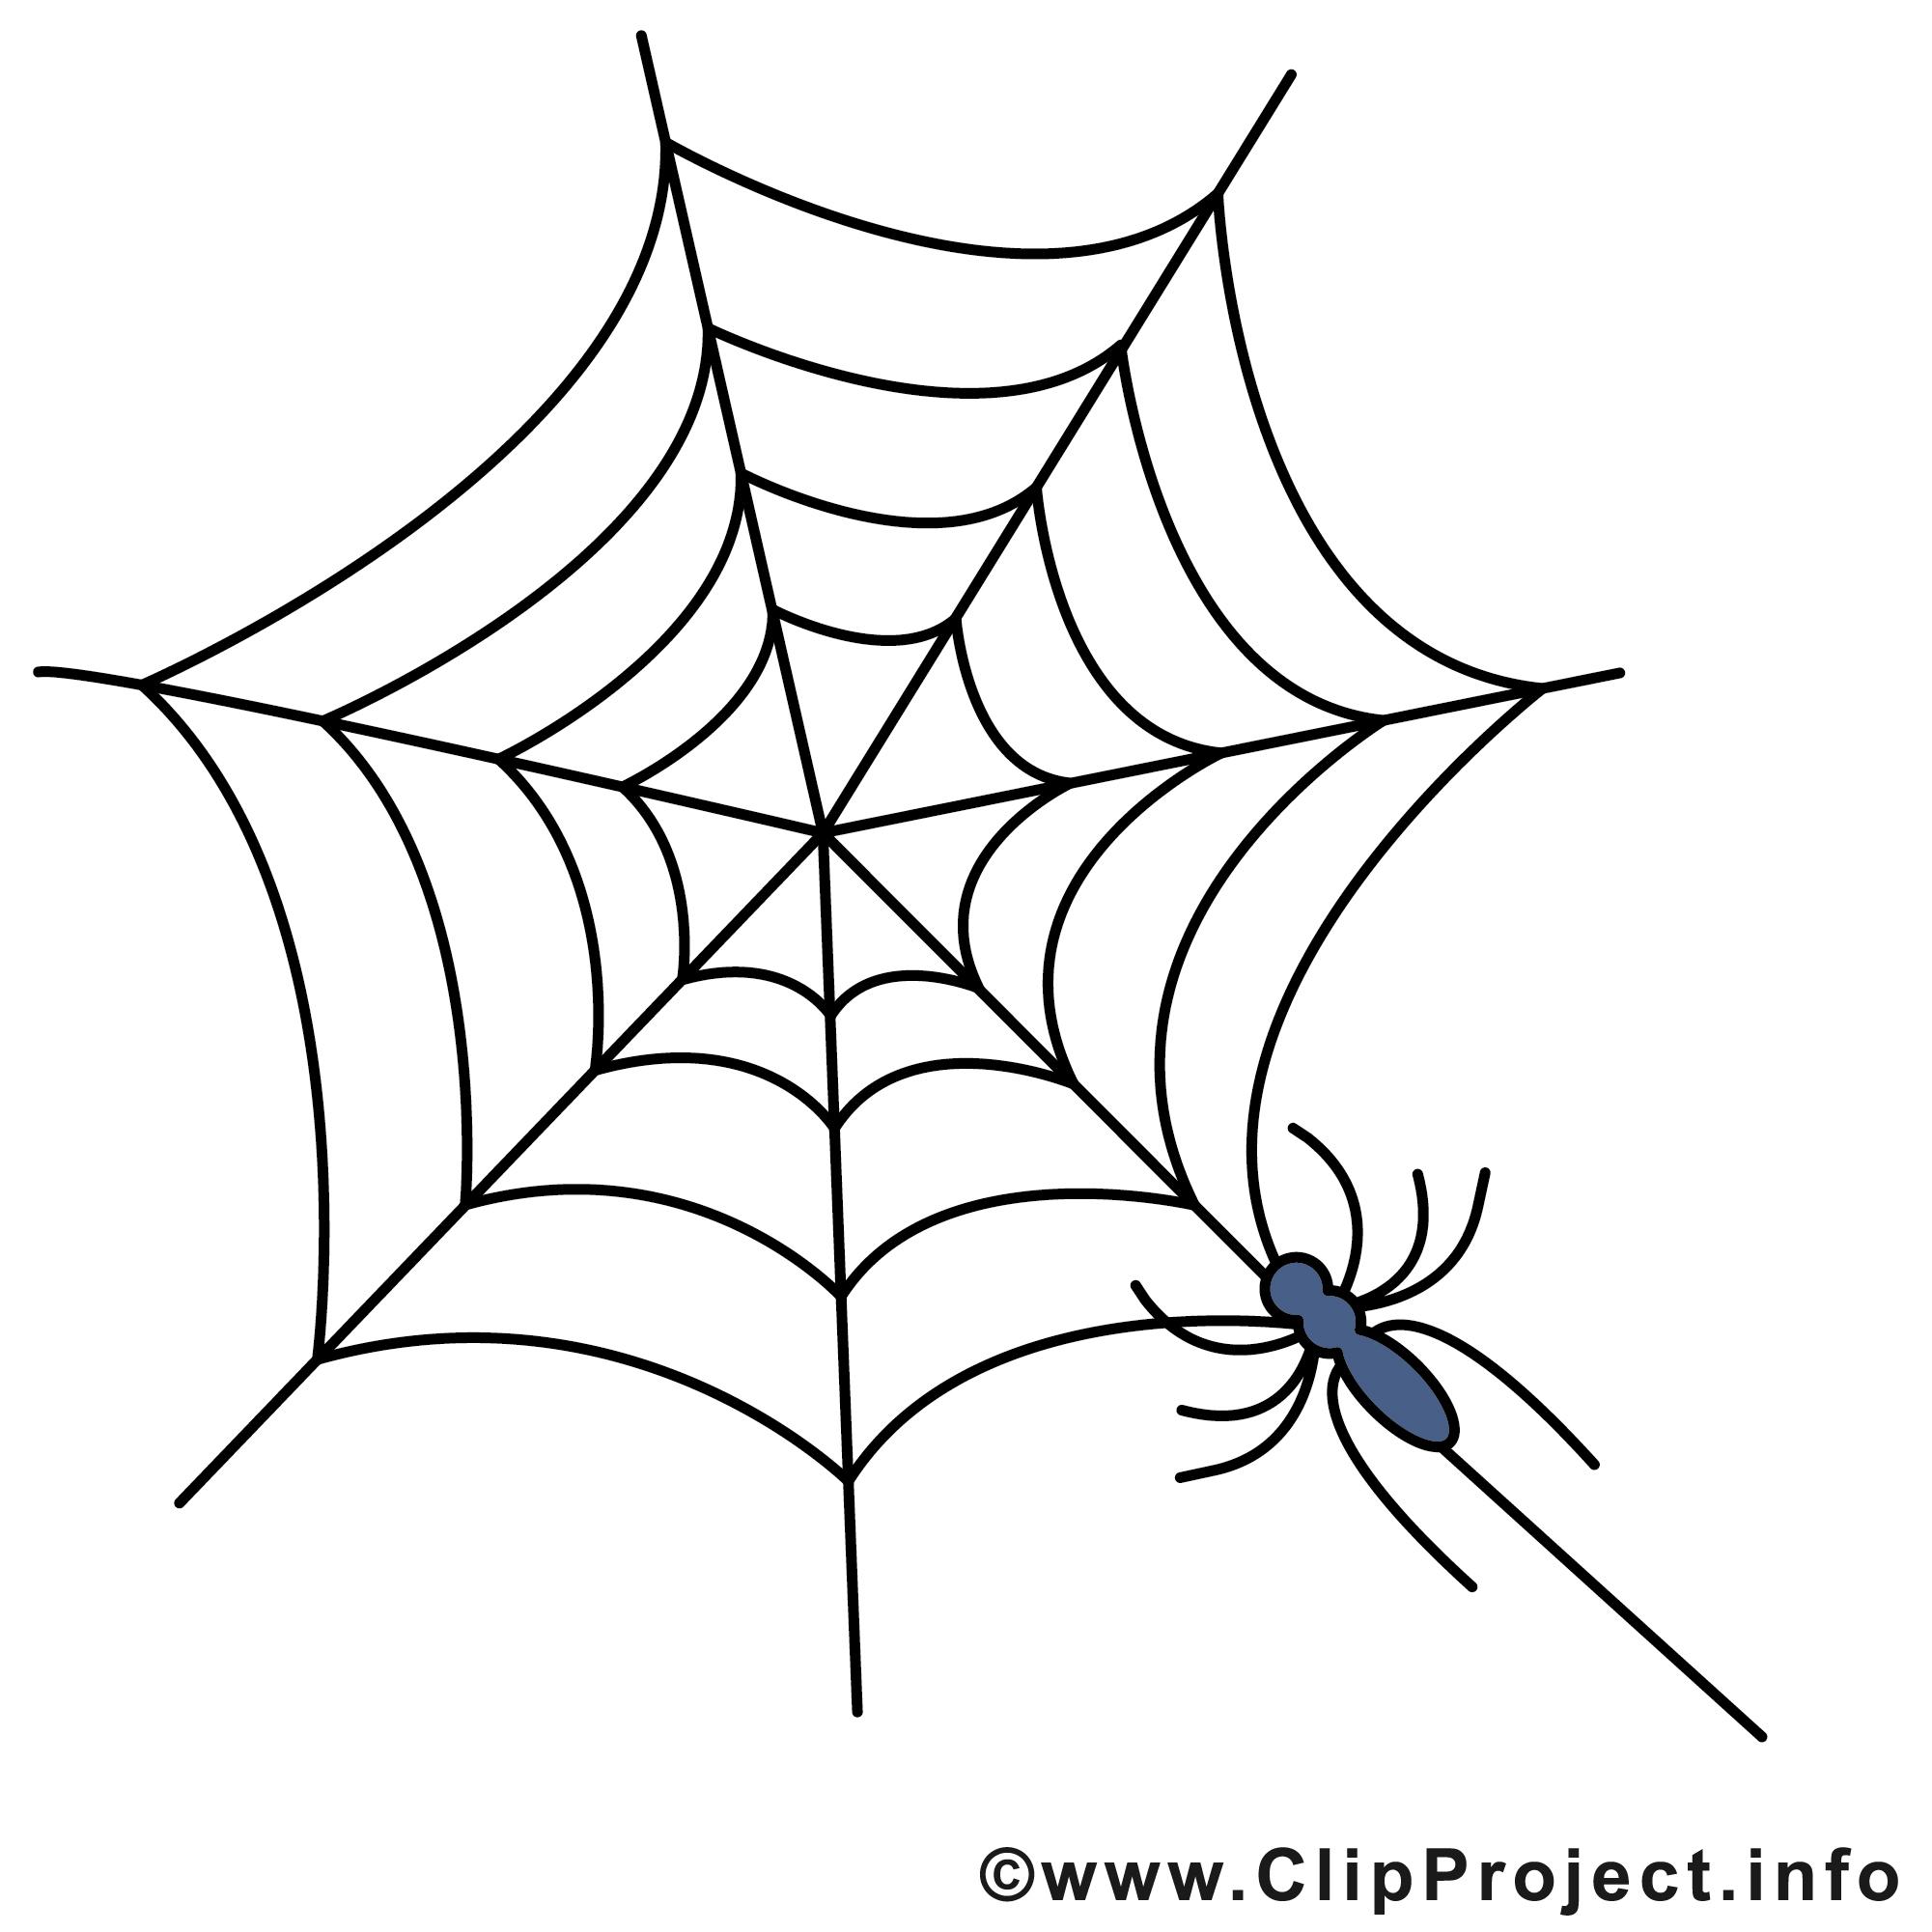 Toile D'araignée Image - Halloween Clipart - Halloween tout Dessin Toile Araignée